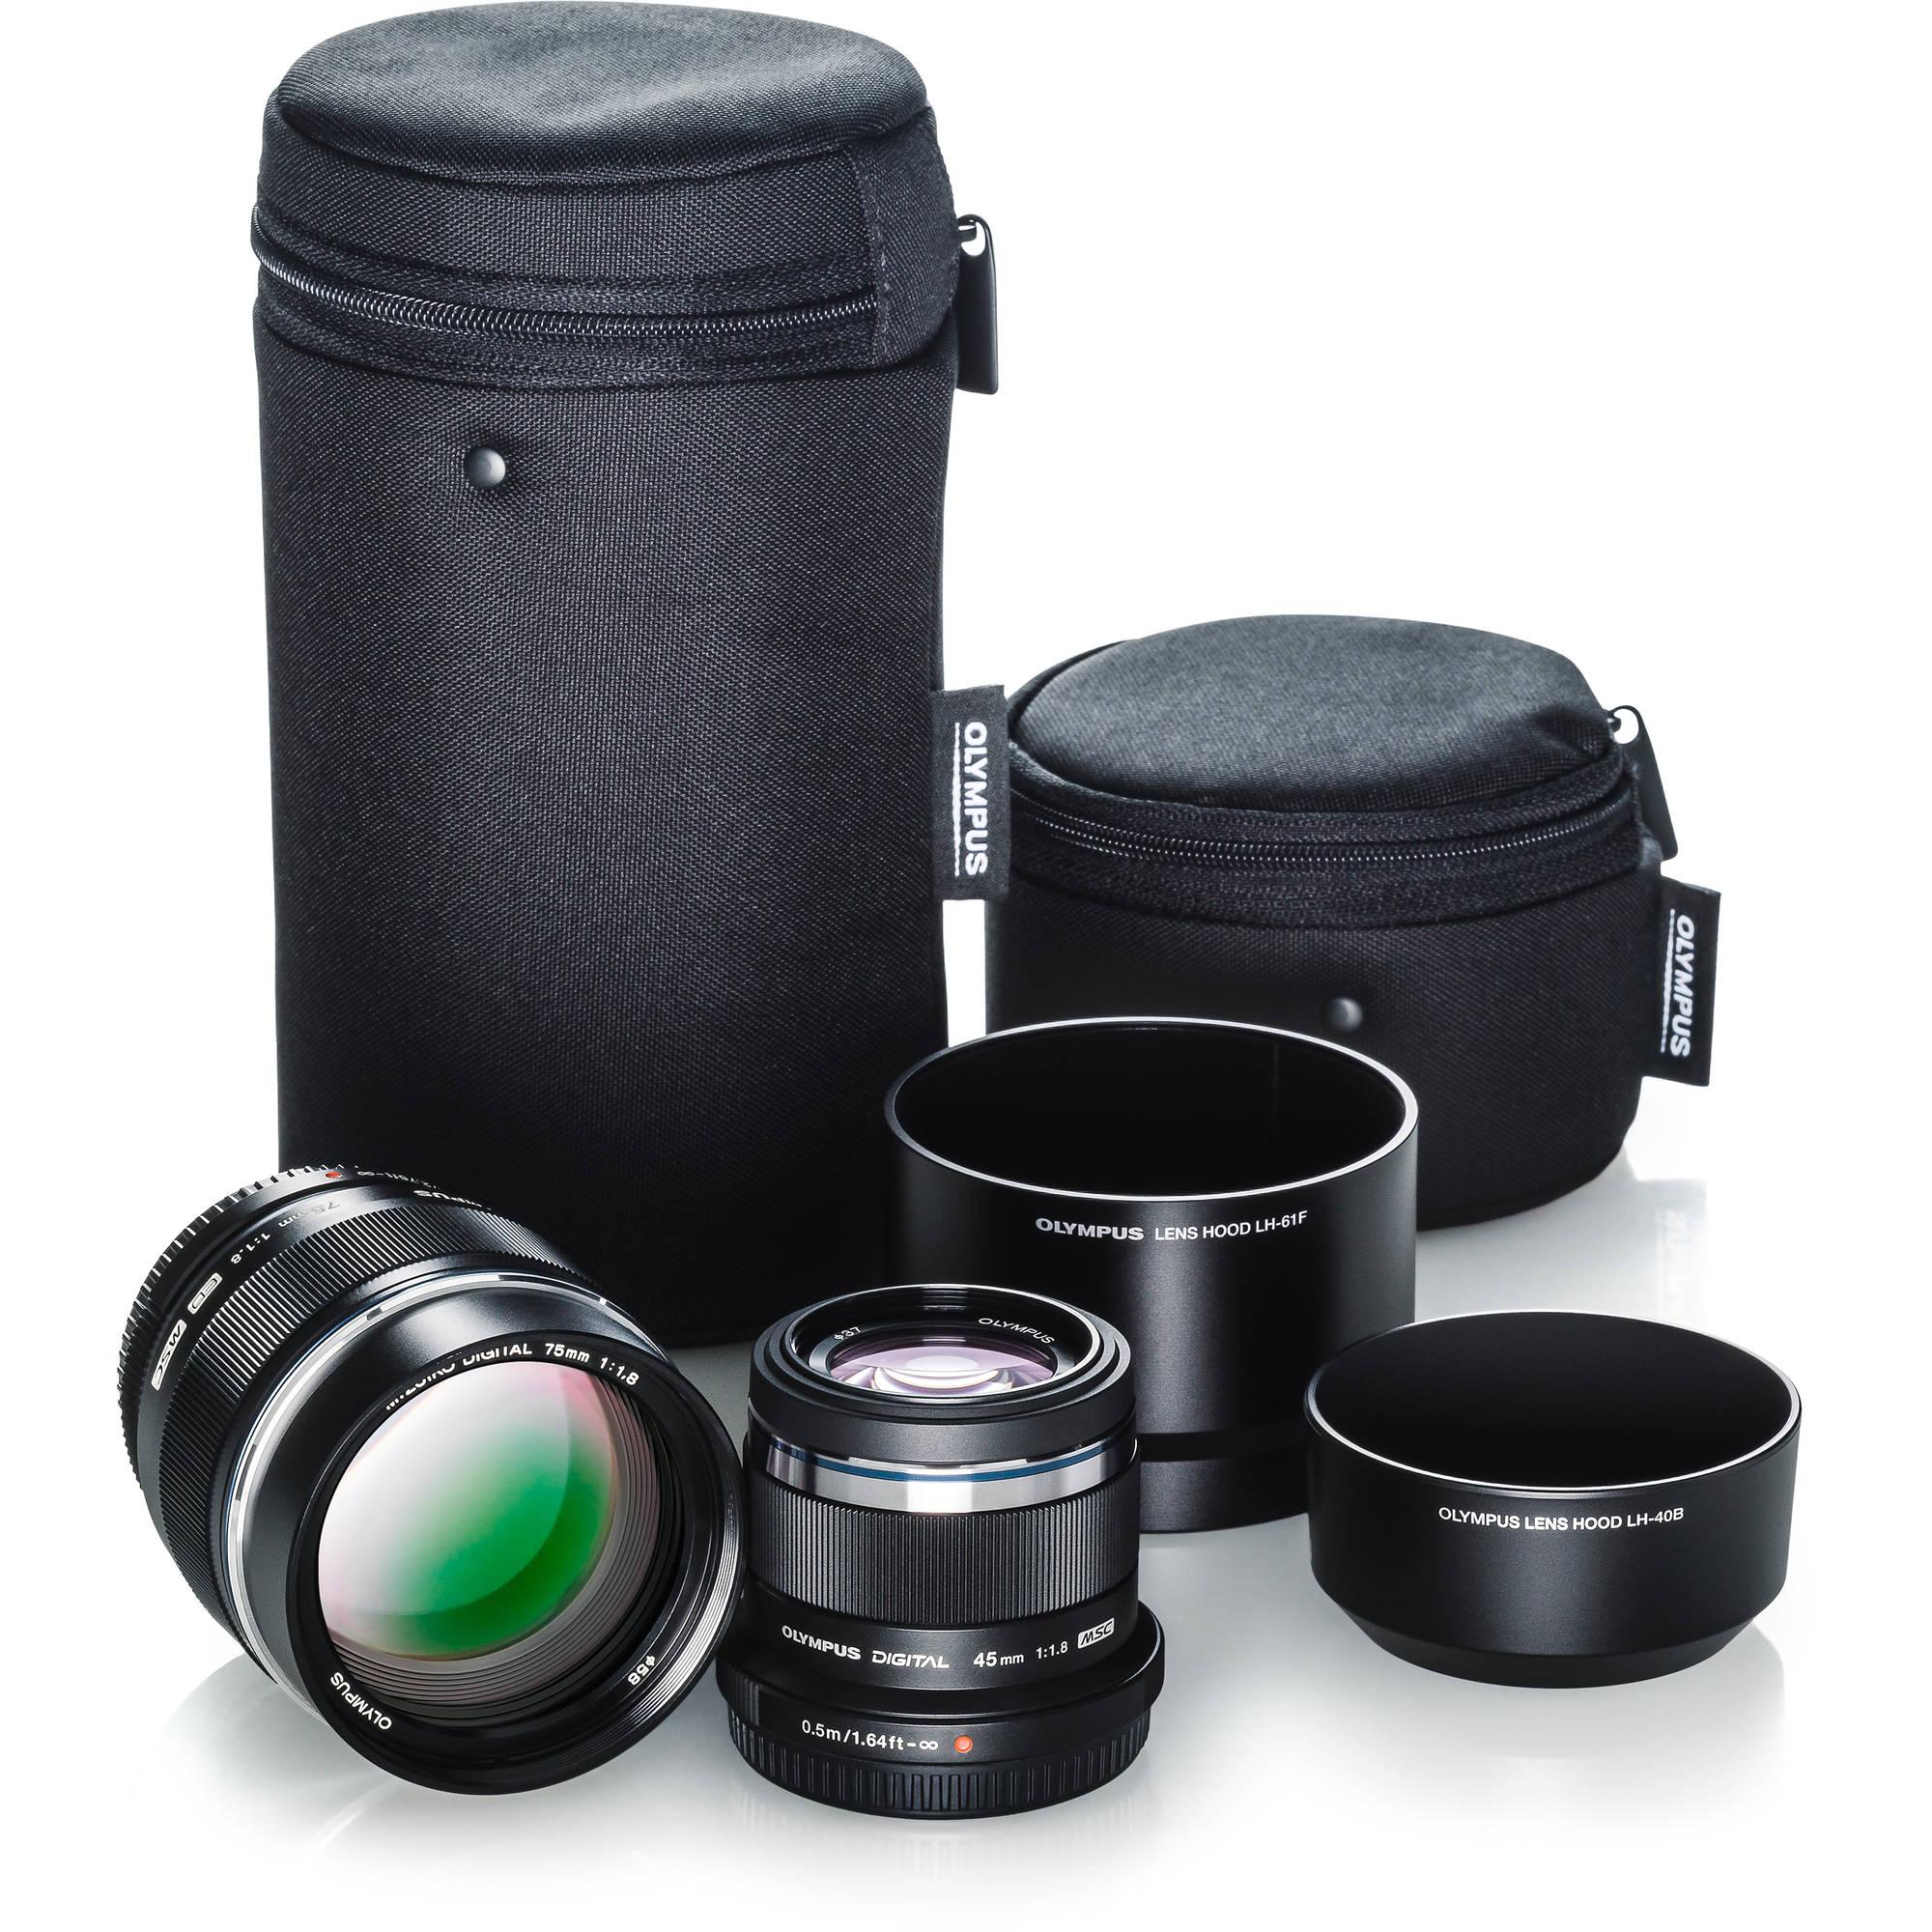 Camera Lens Hood for Olympus M.ZUIKO Digital OLYMPUS LH-40B 45mm f//1.8 Lens UK